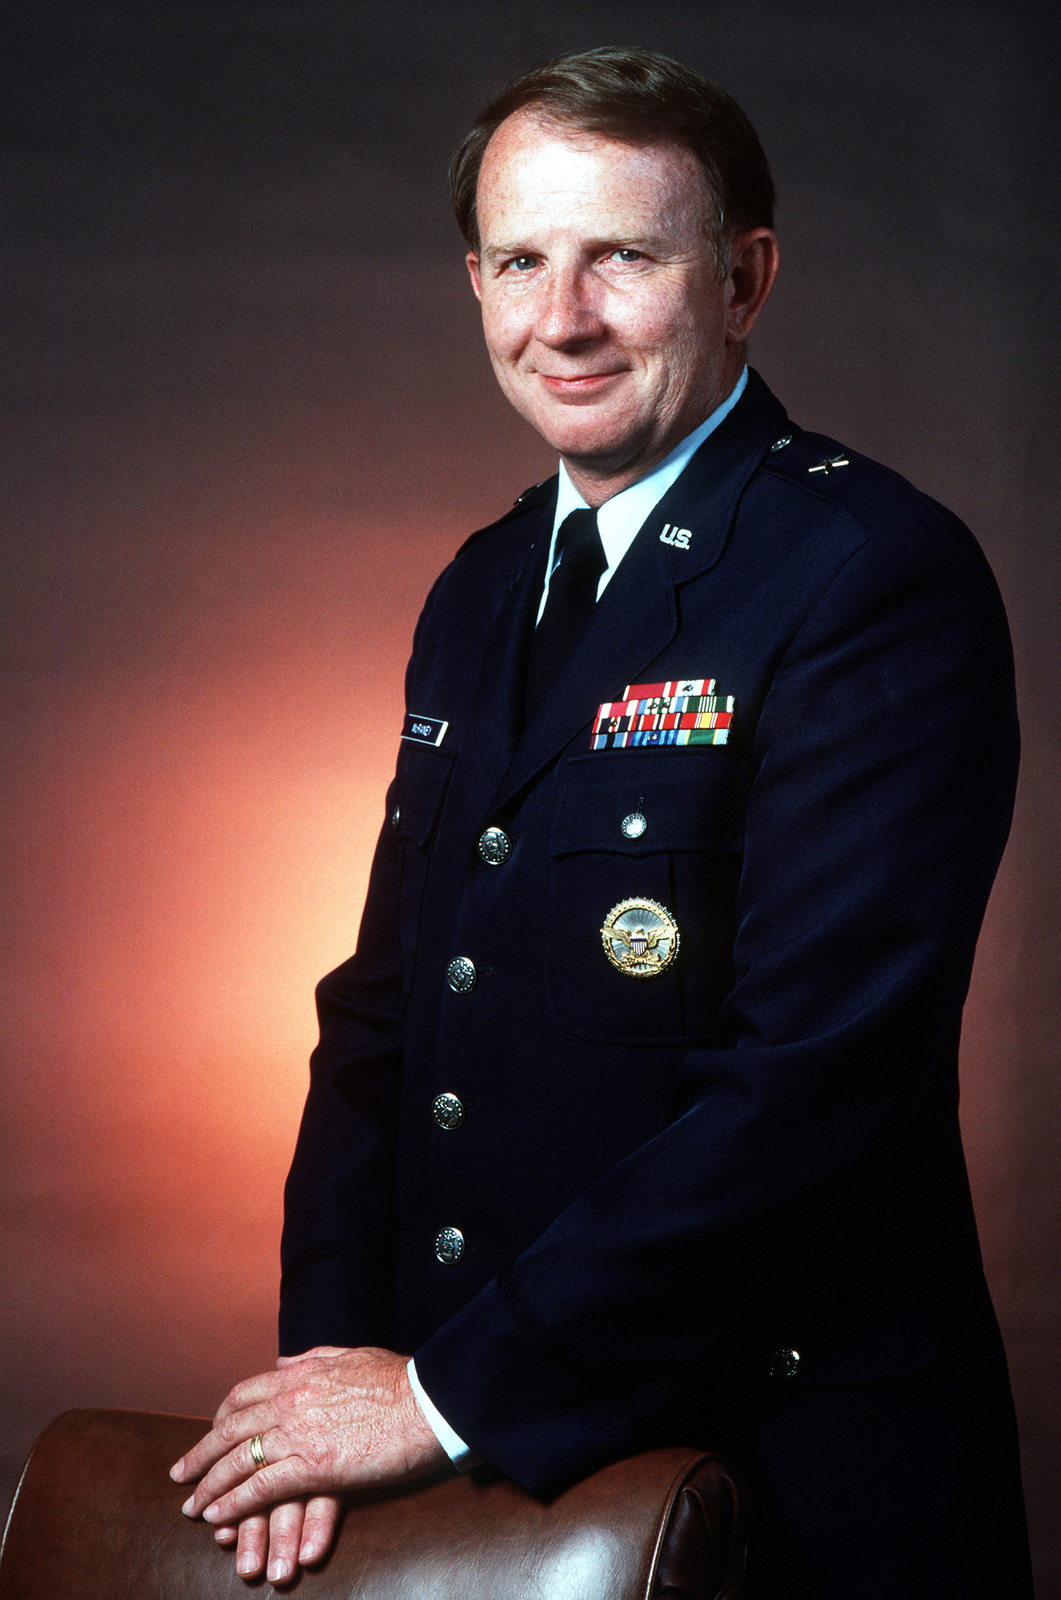 BGEN Michael P. McRaney, USAF (uncovered)